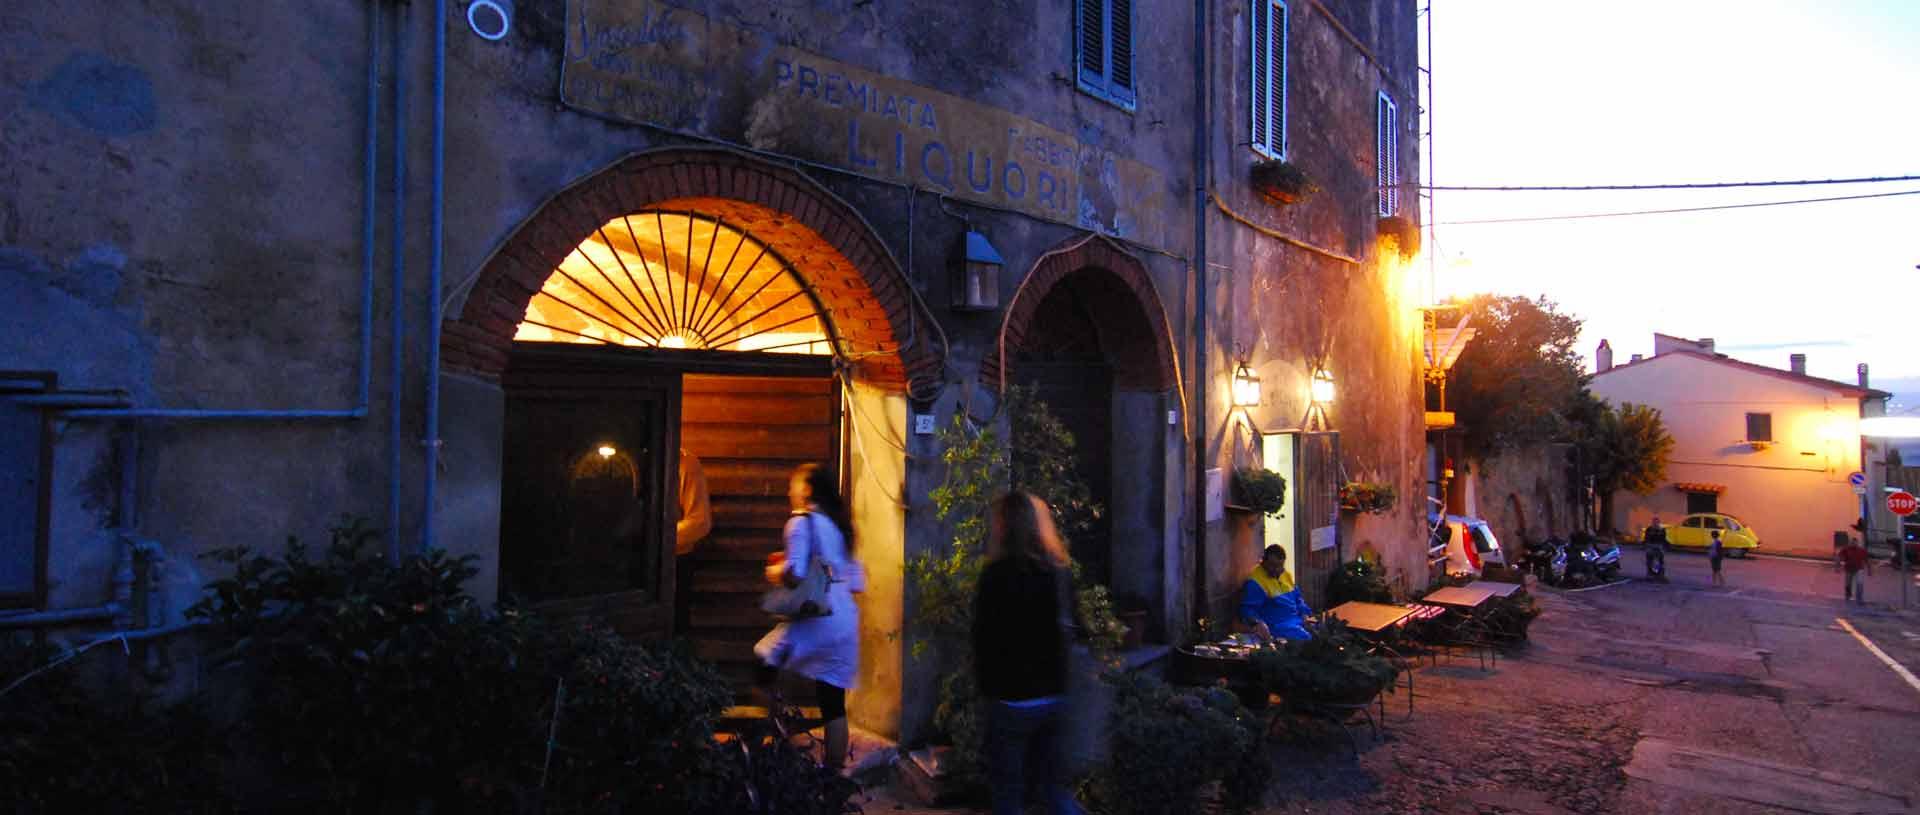 Italian Hill Towns at Night in Castagneto Carducci